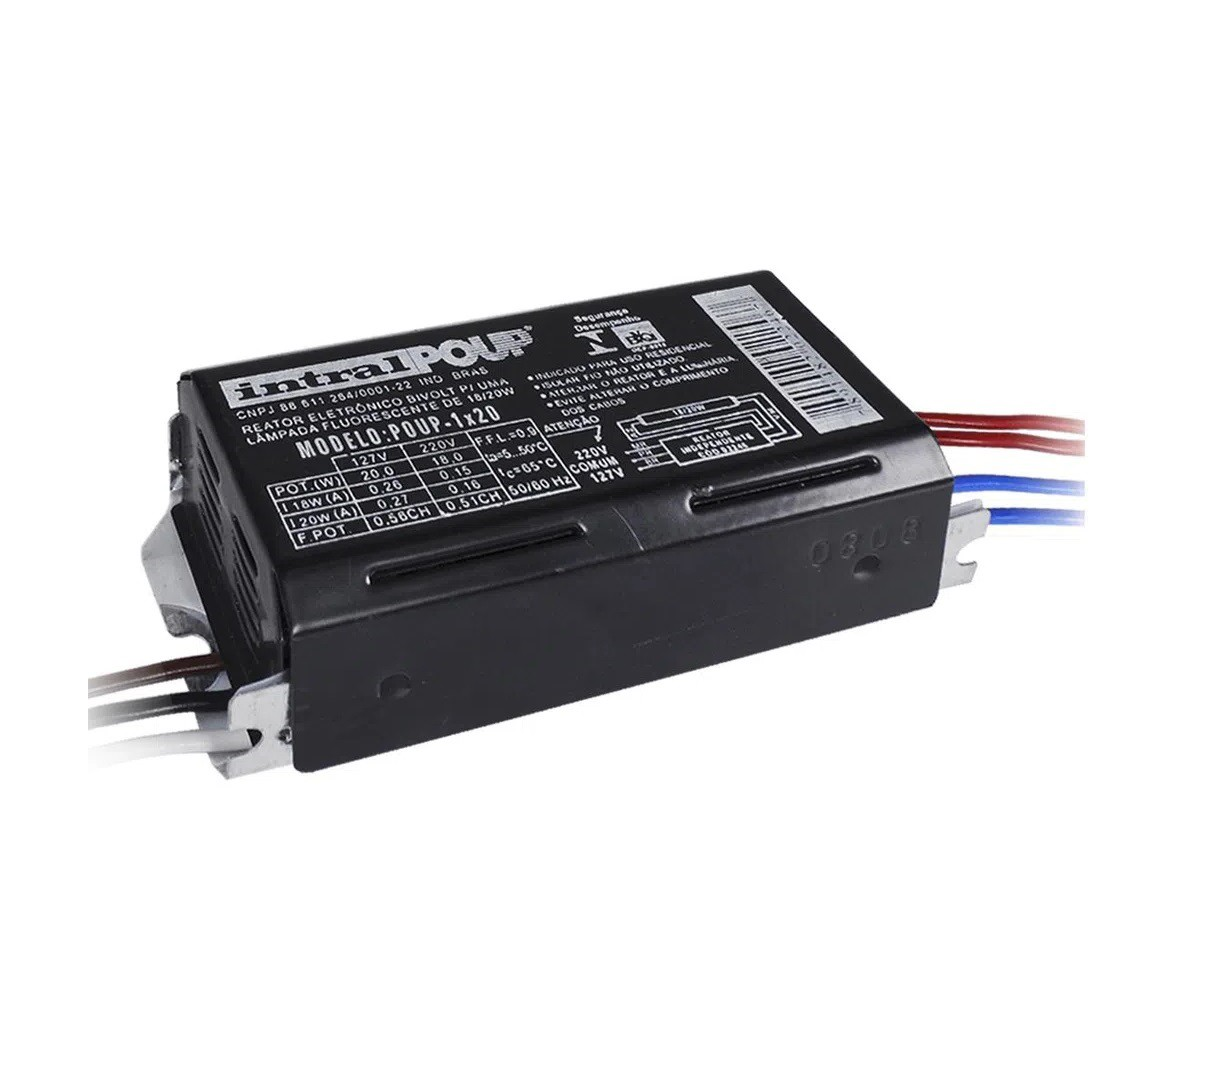 Reator Intral Eletronico 1 X 20W (kit com 5 Unidades)